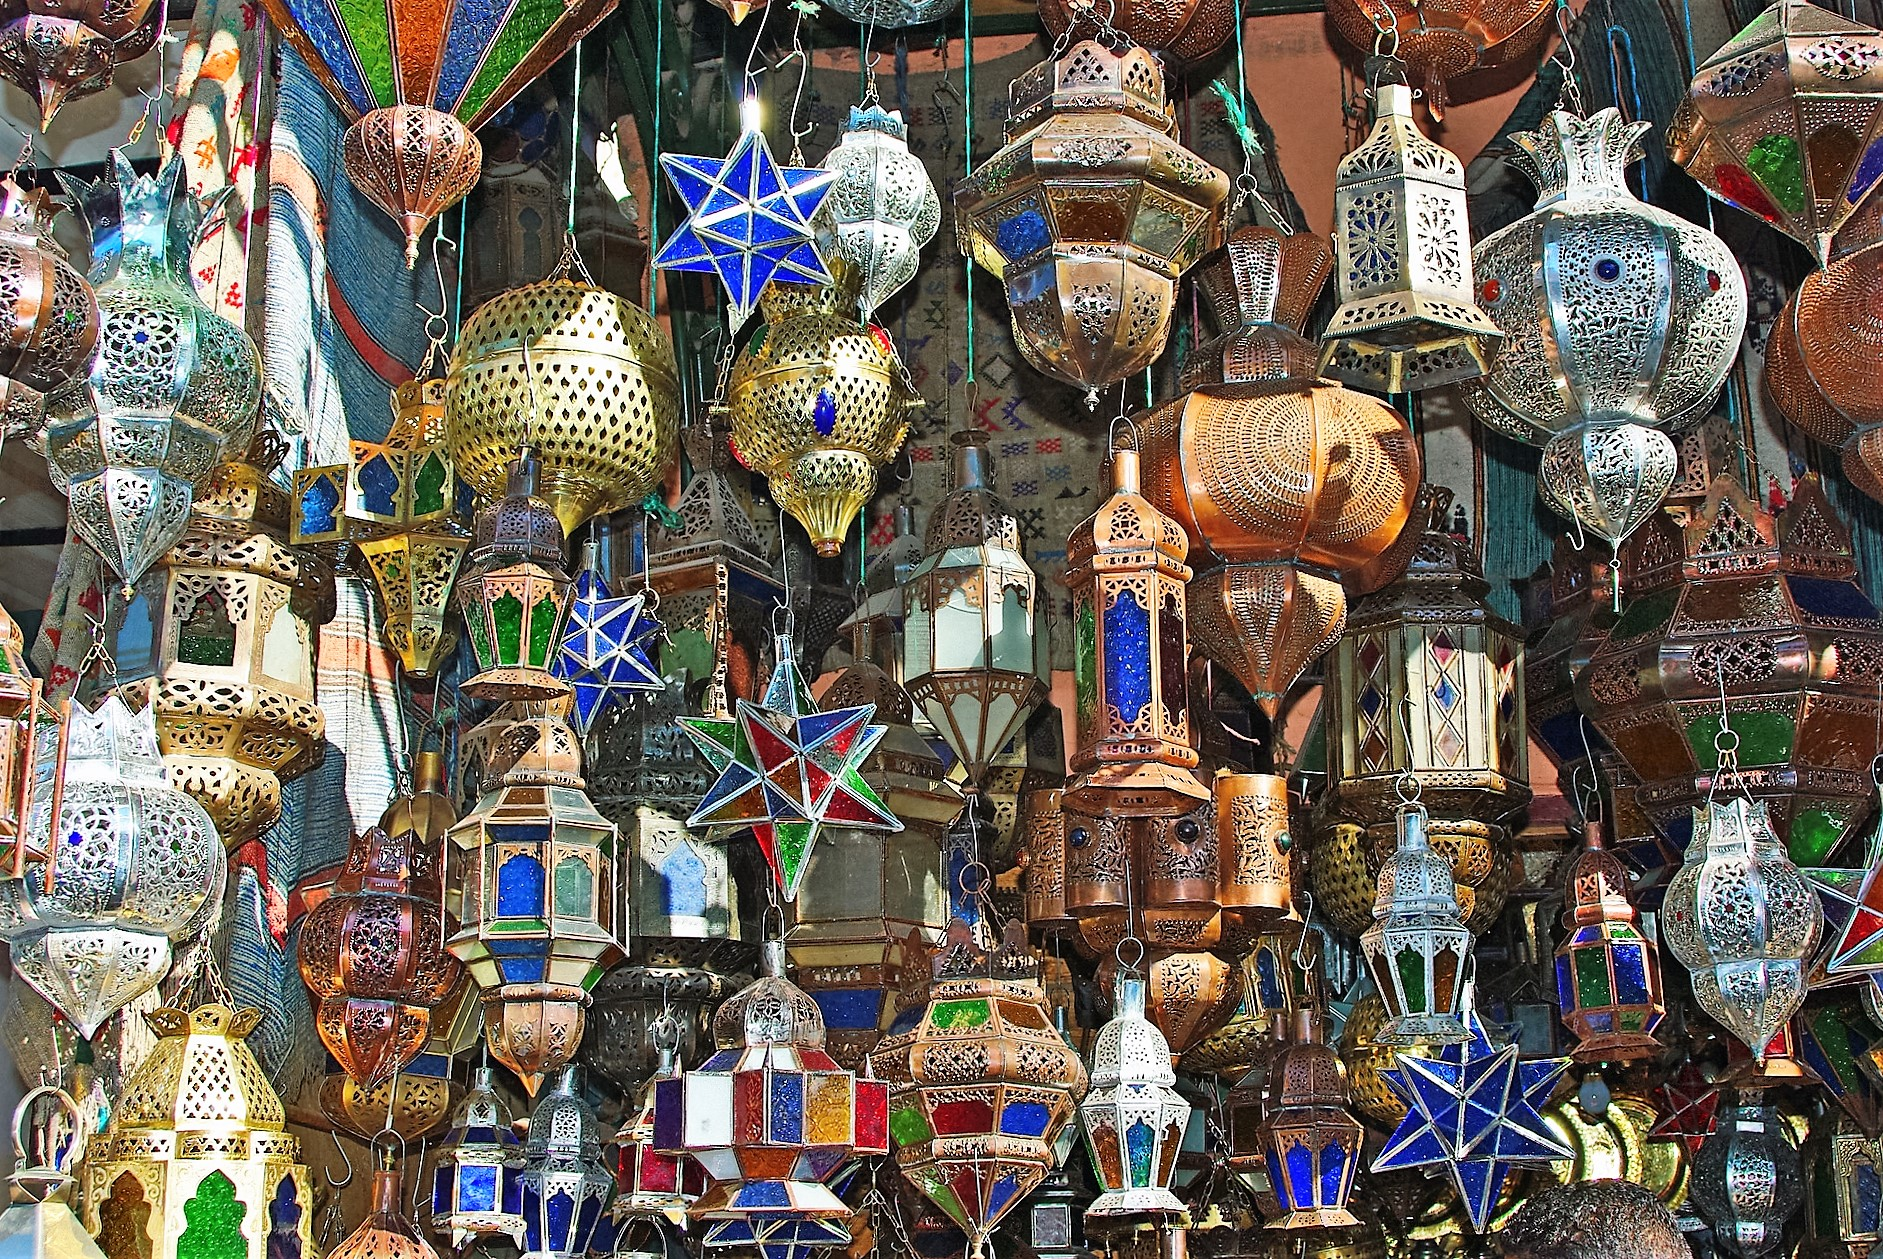 marrakech - lanterns